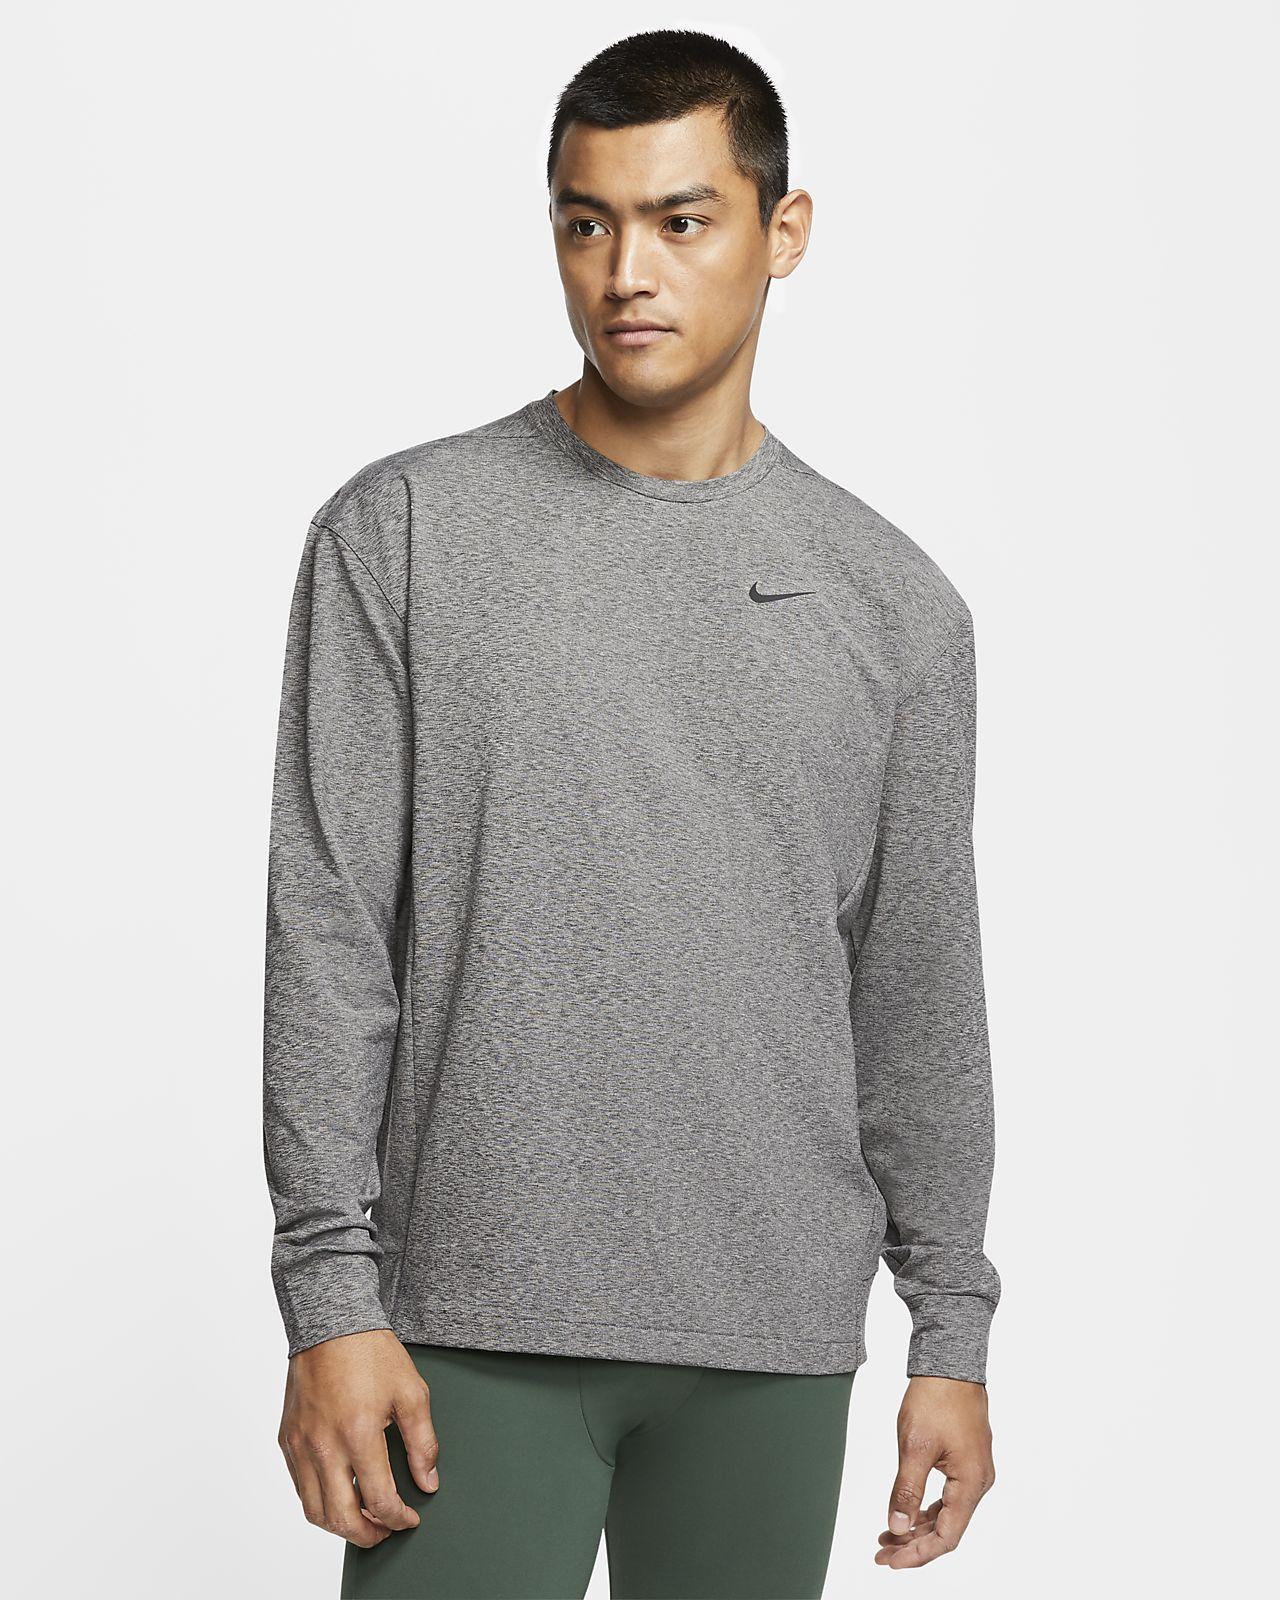 Nike Yoga Dri FIT Langarm Oberteil für Herren